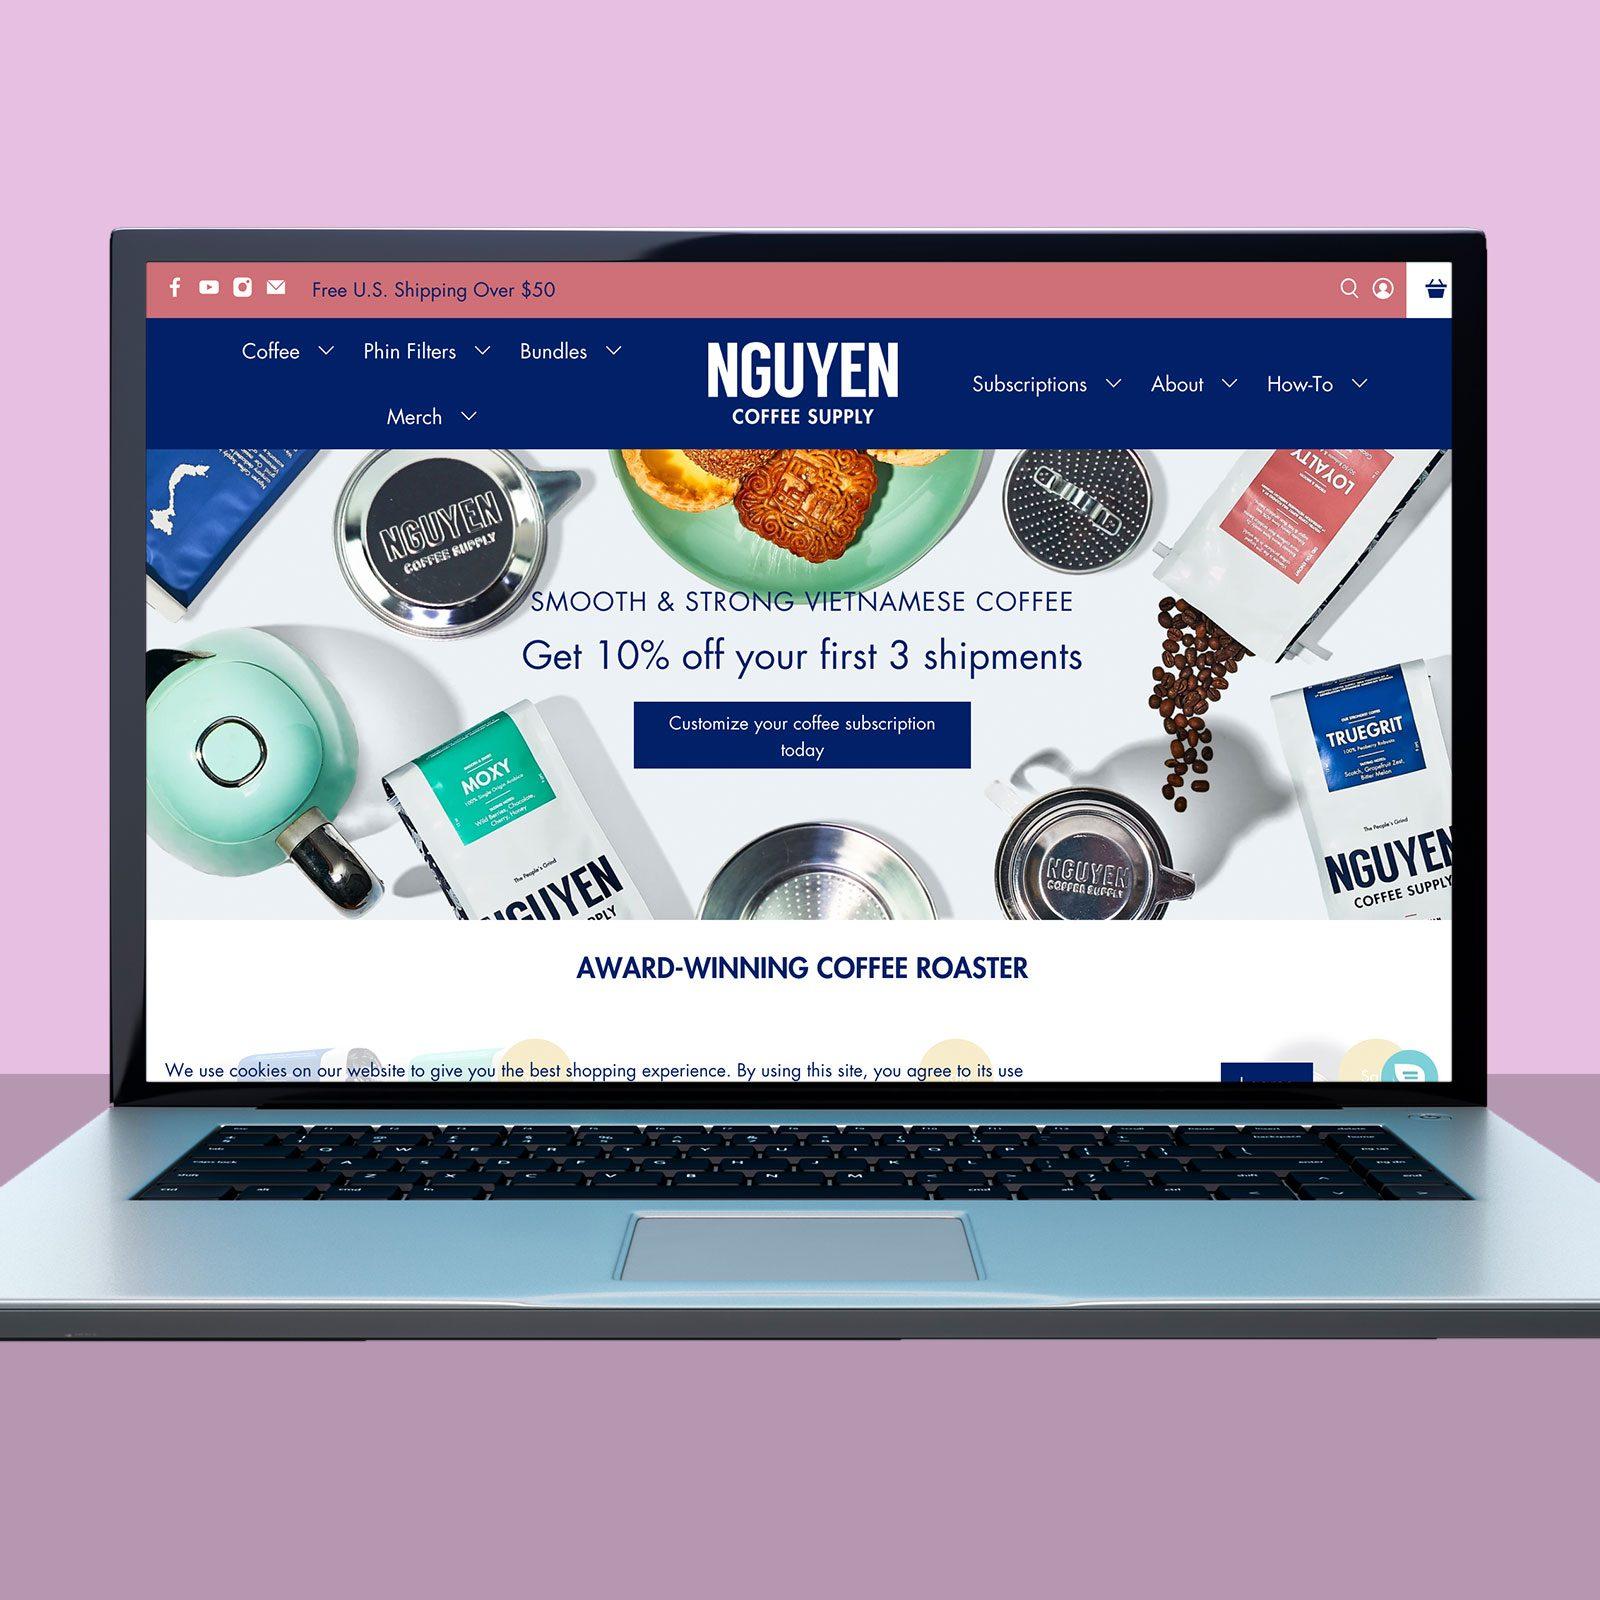 Nguyencoffeesupply.com